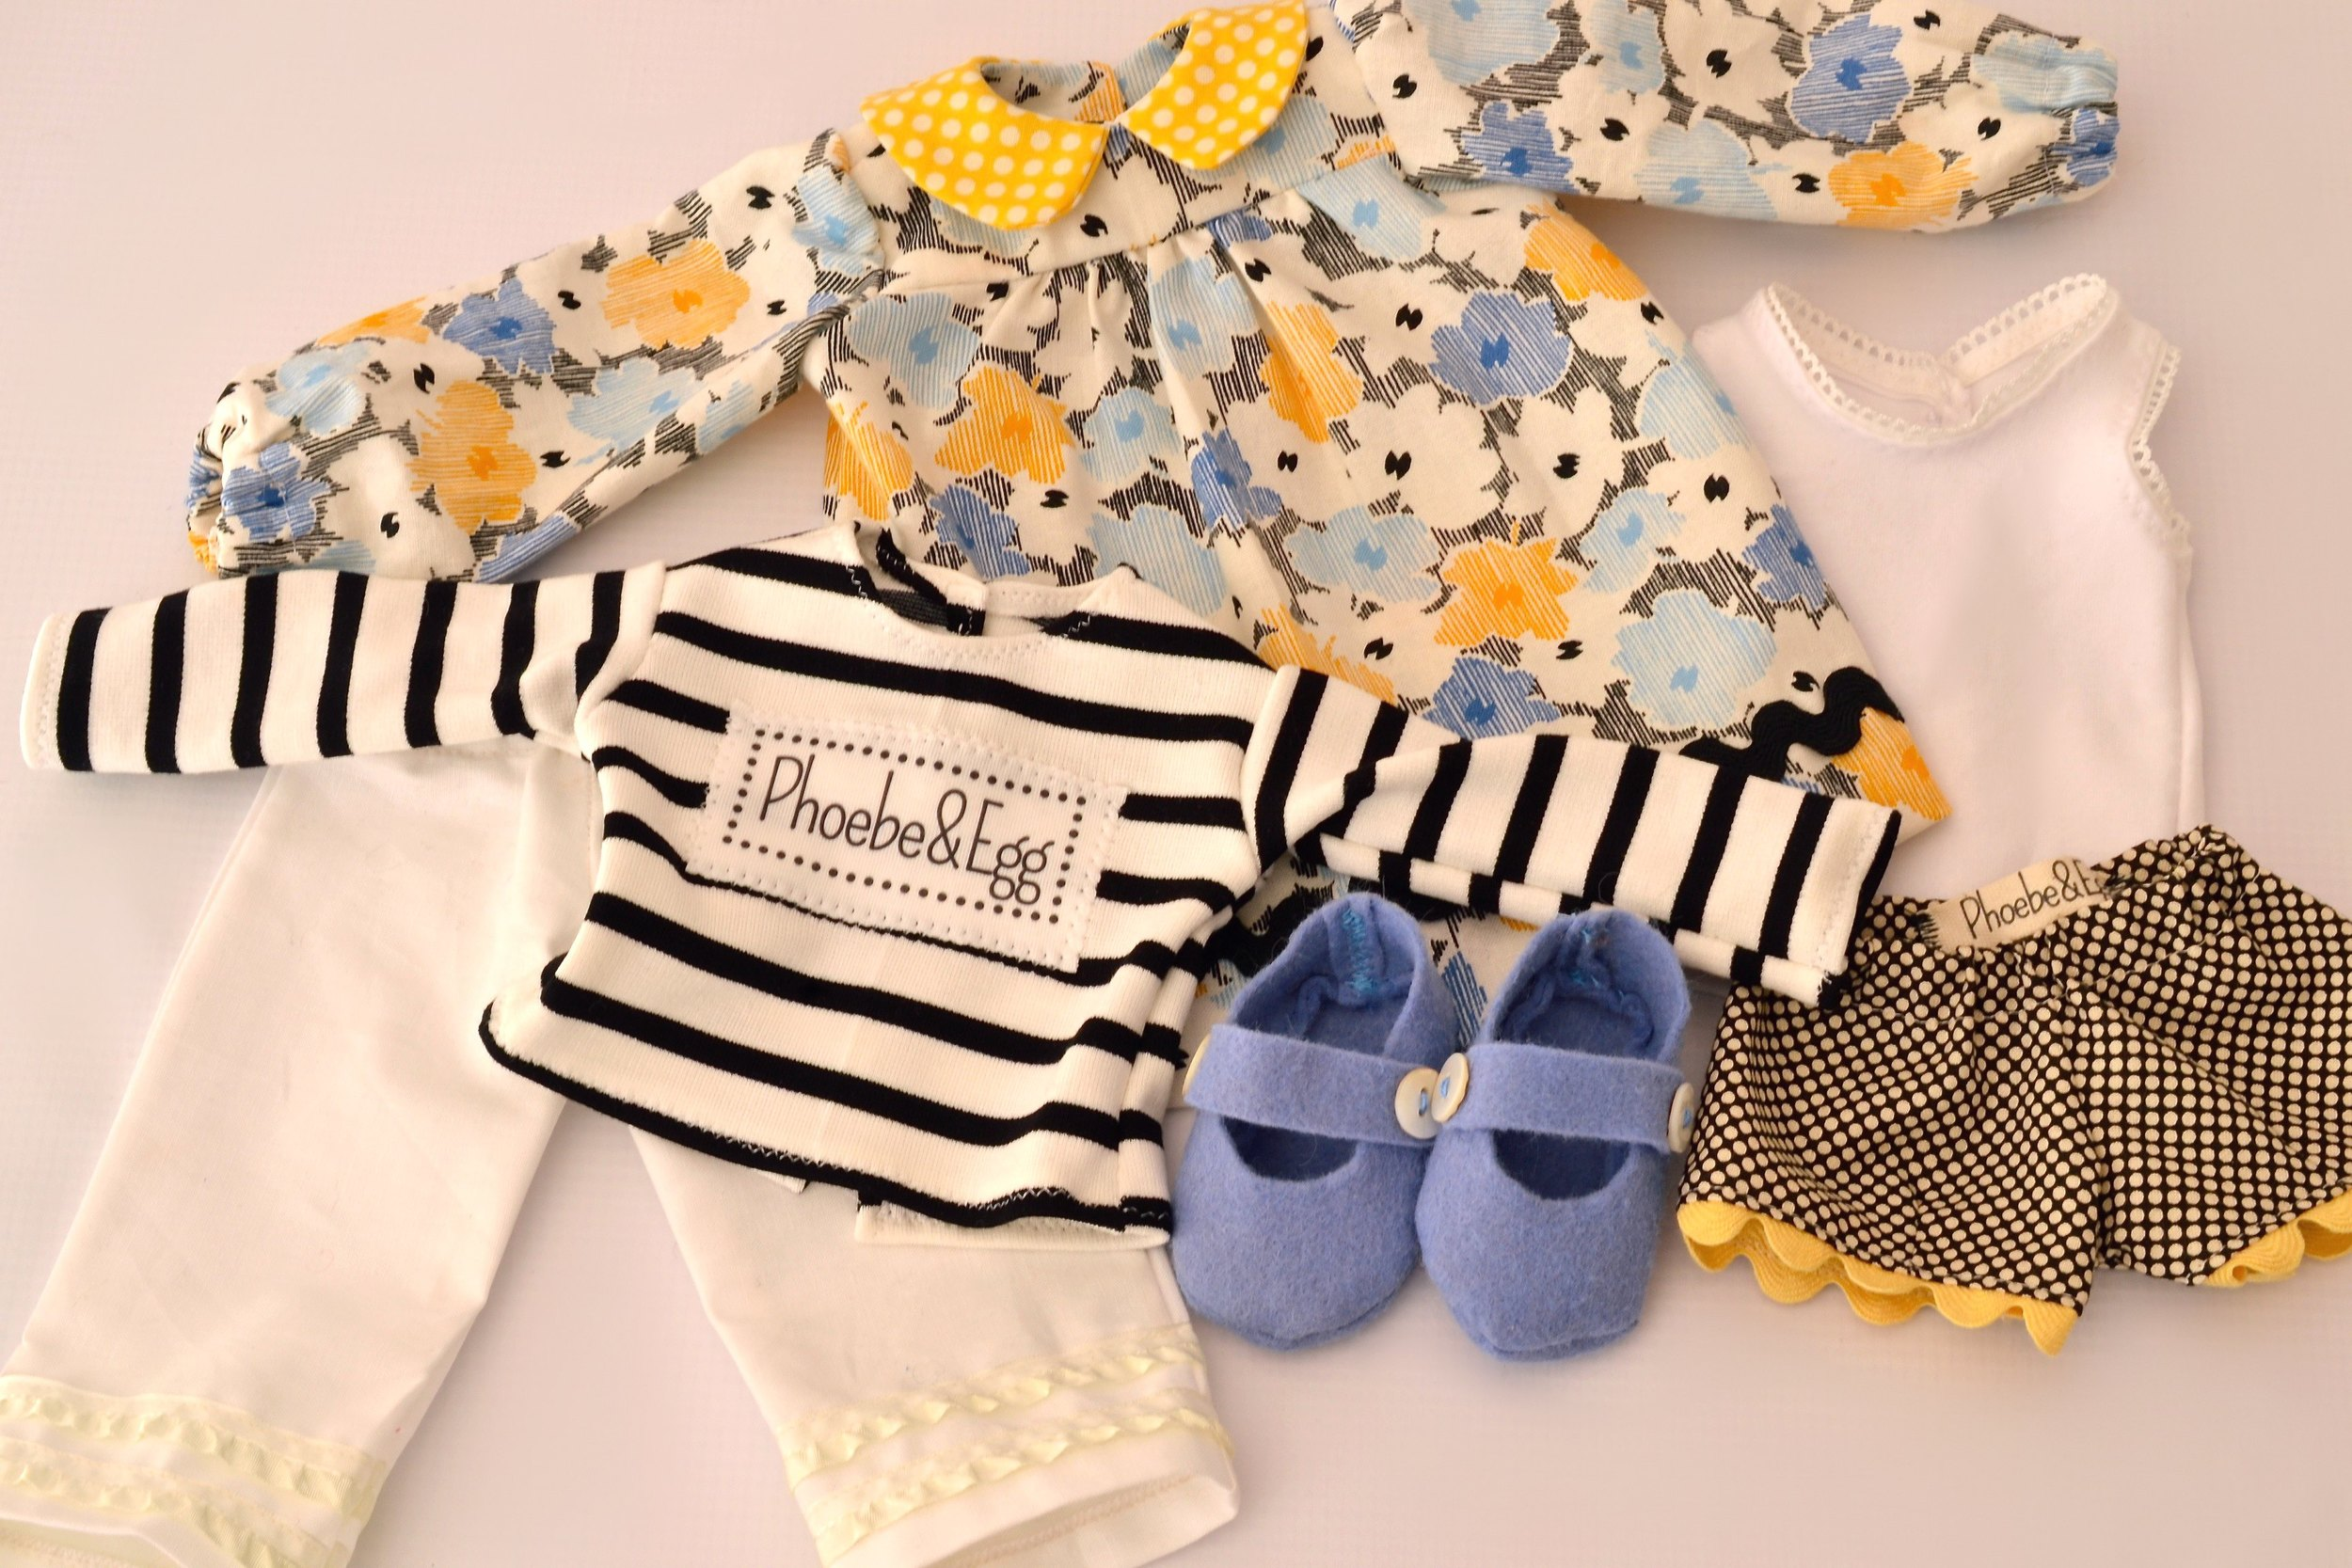 Phoebe's clothes